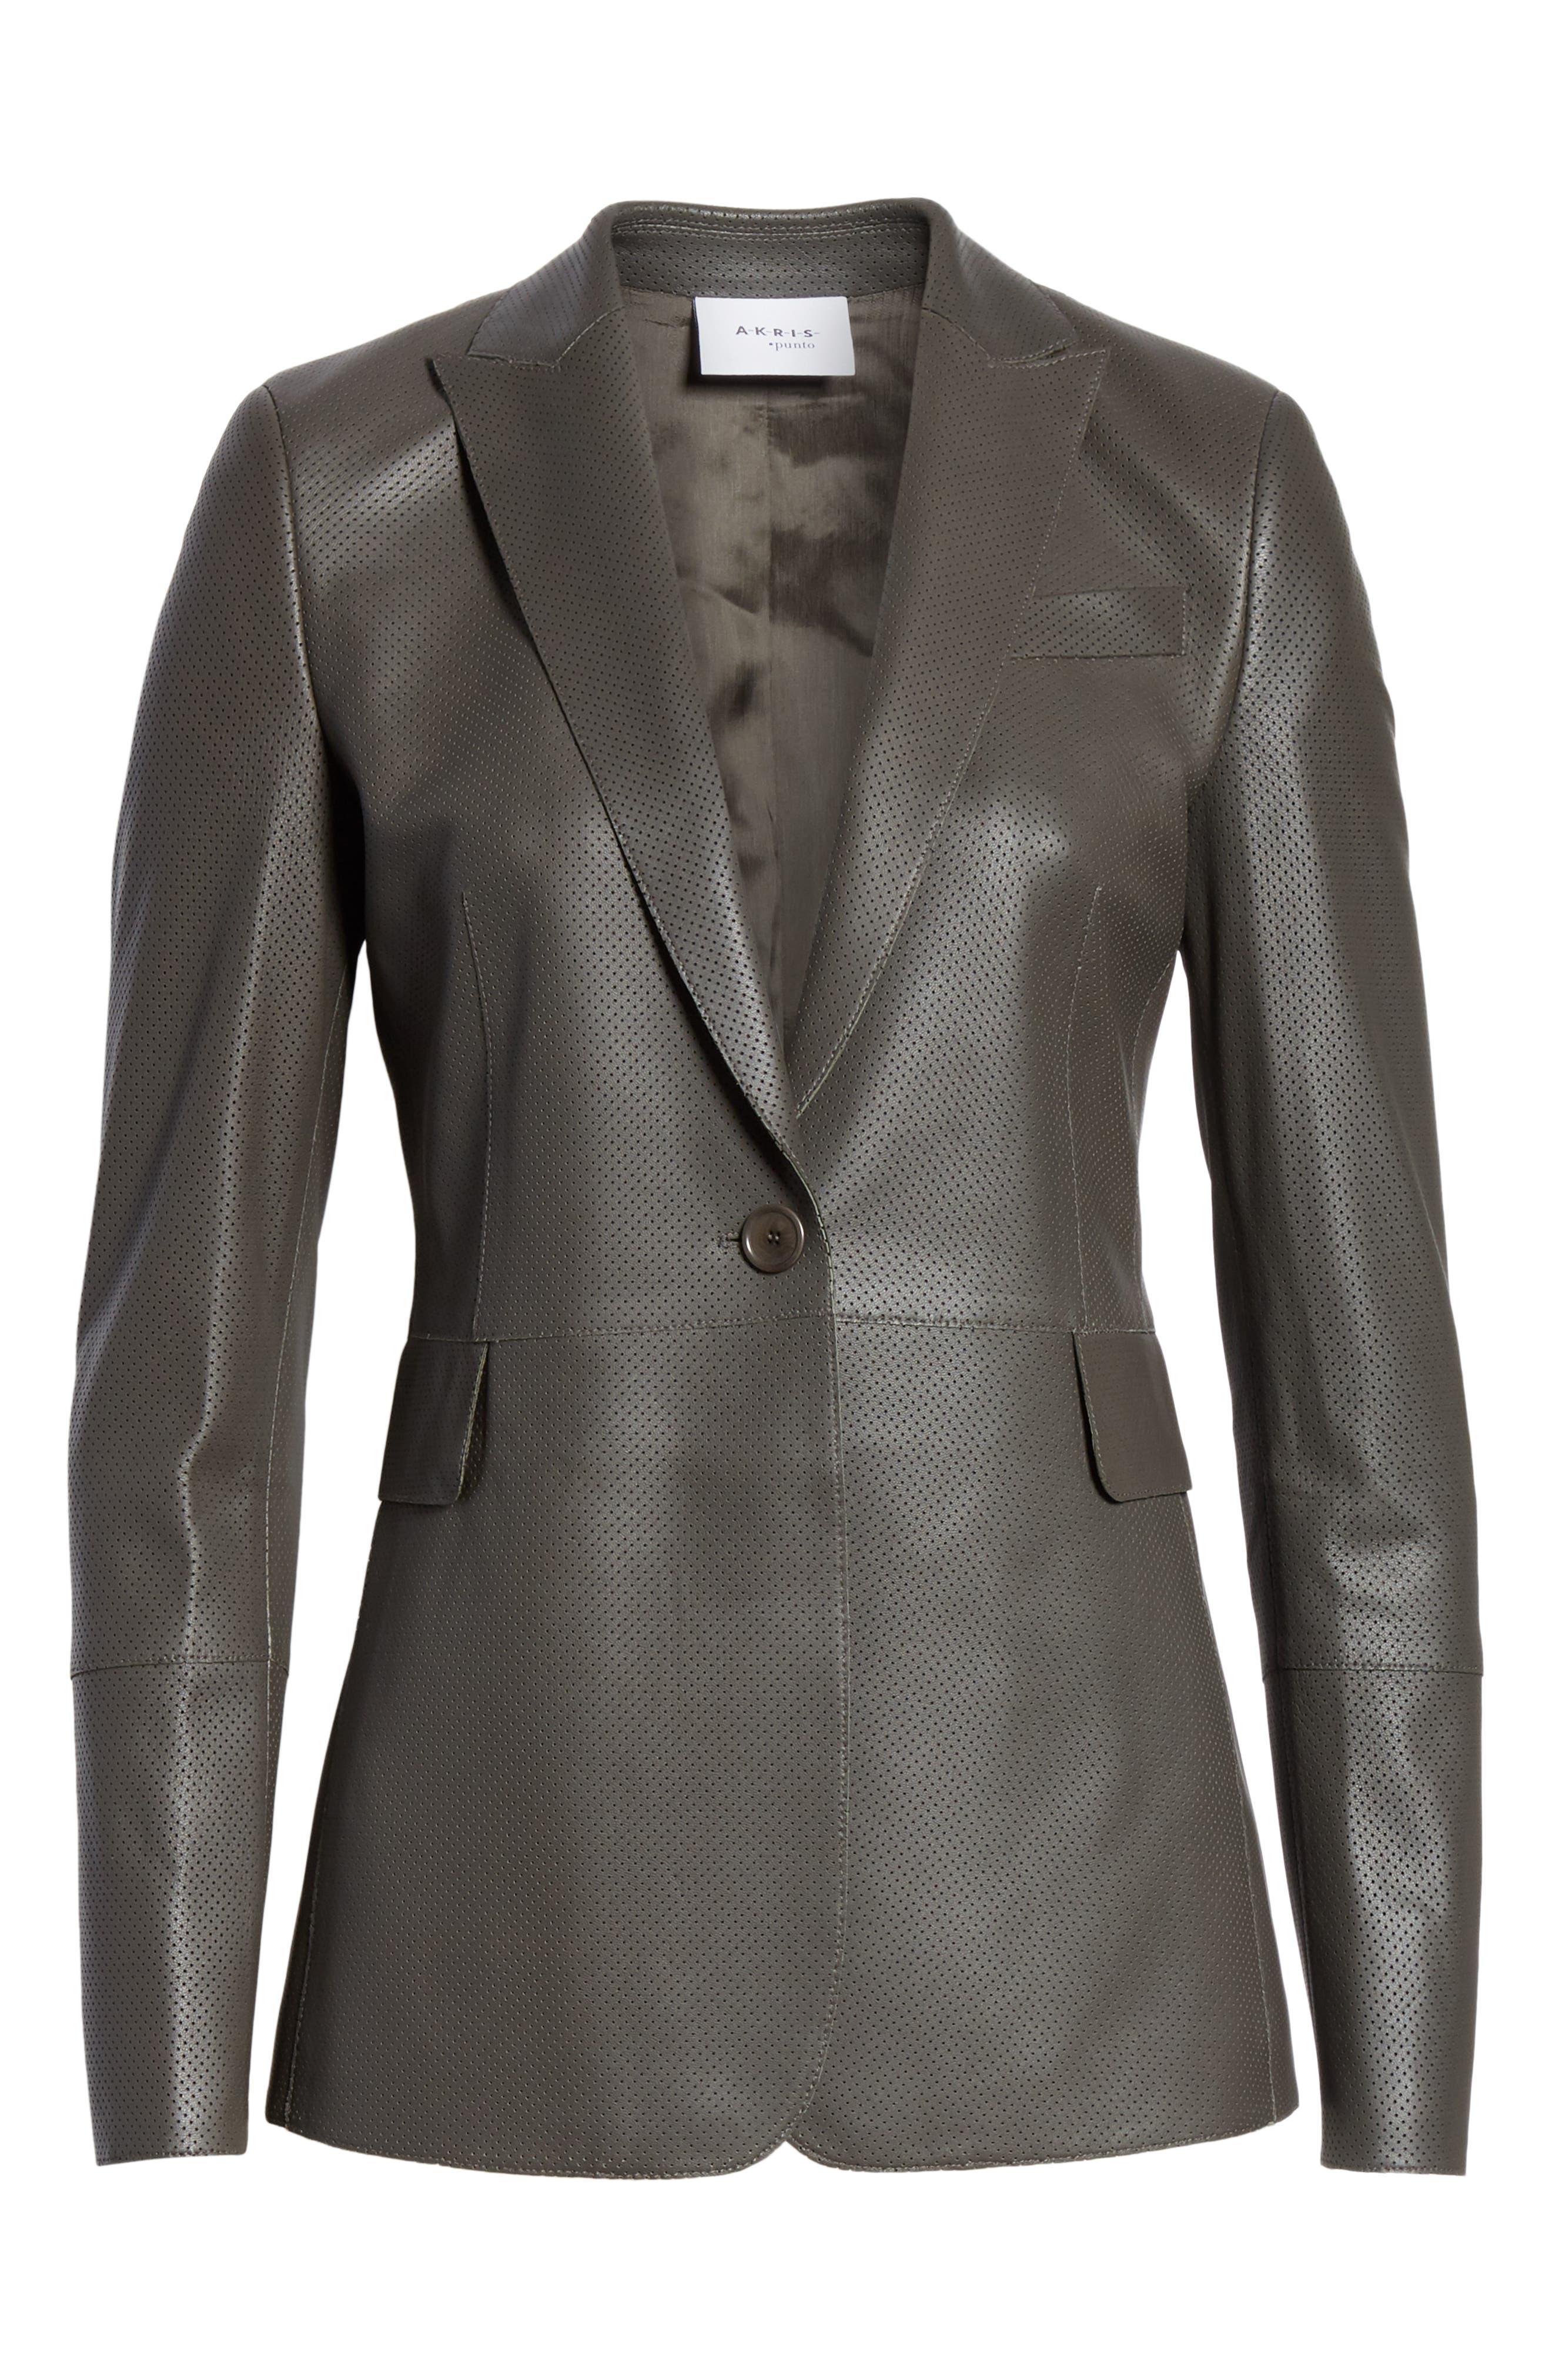 AKRIS PUNTO,                             Perforated Leather Blazer,                             Alternate thumbnail 3, color,                             OLIVA